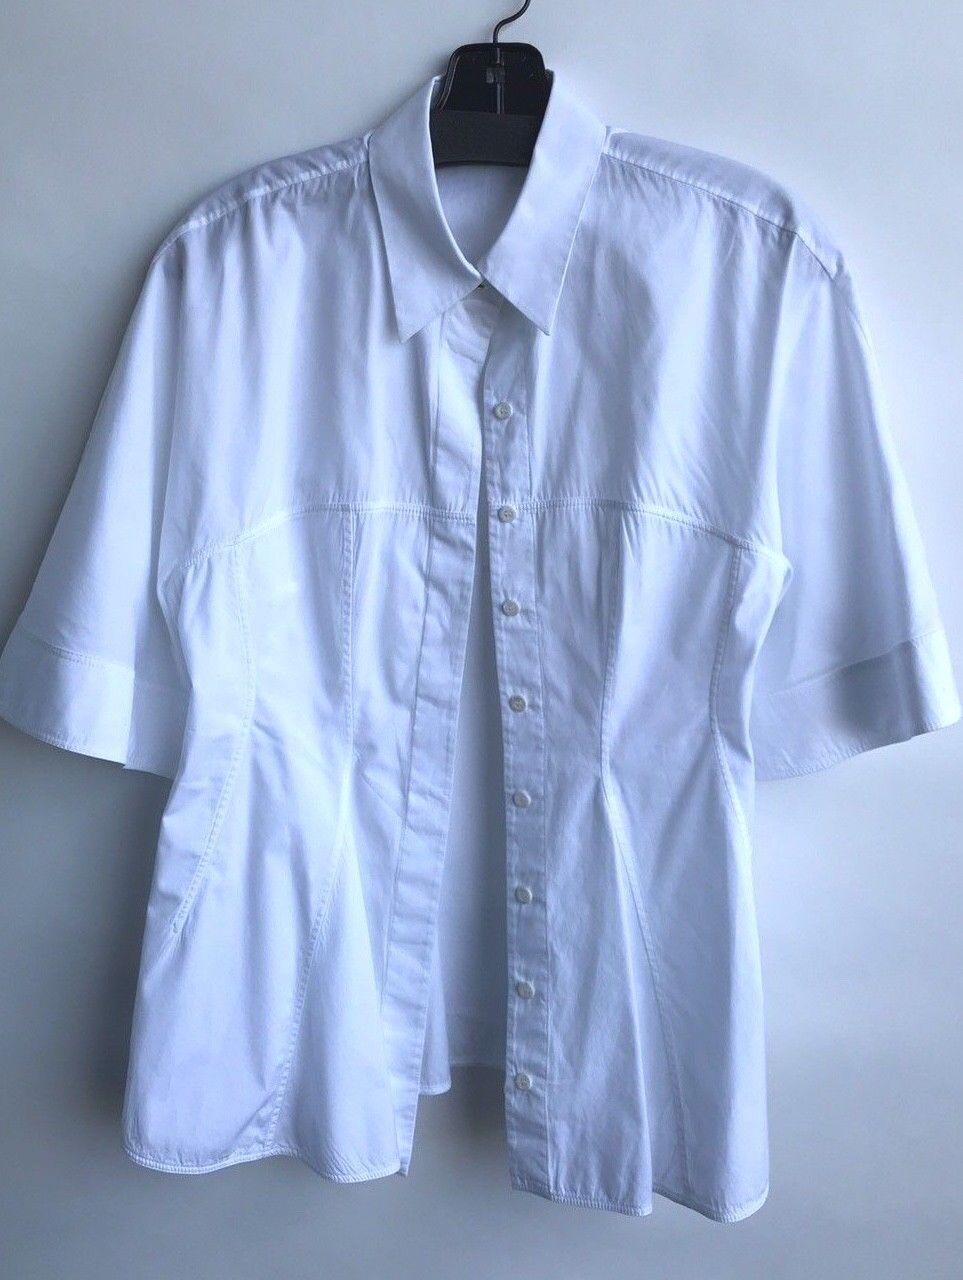 Givenchy Size 42 White Button Down Blouse